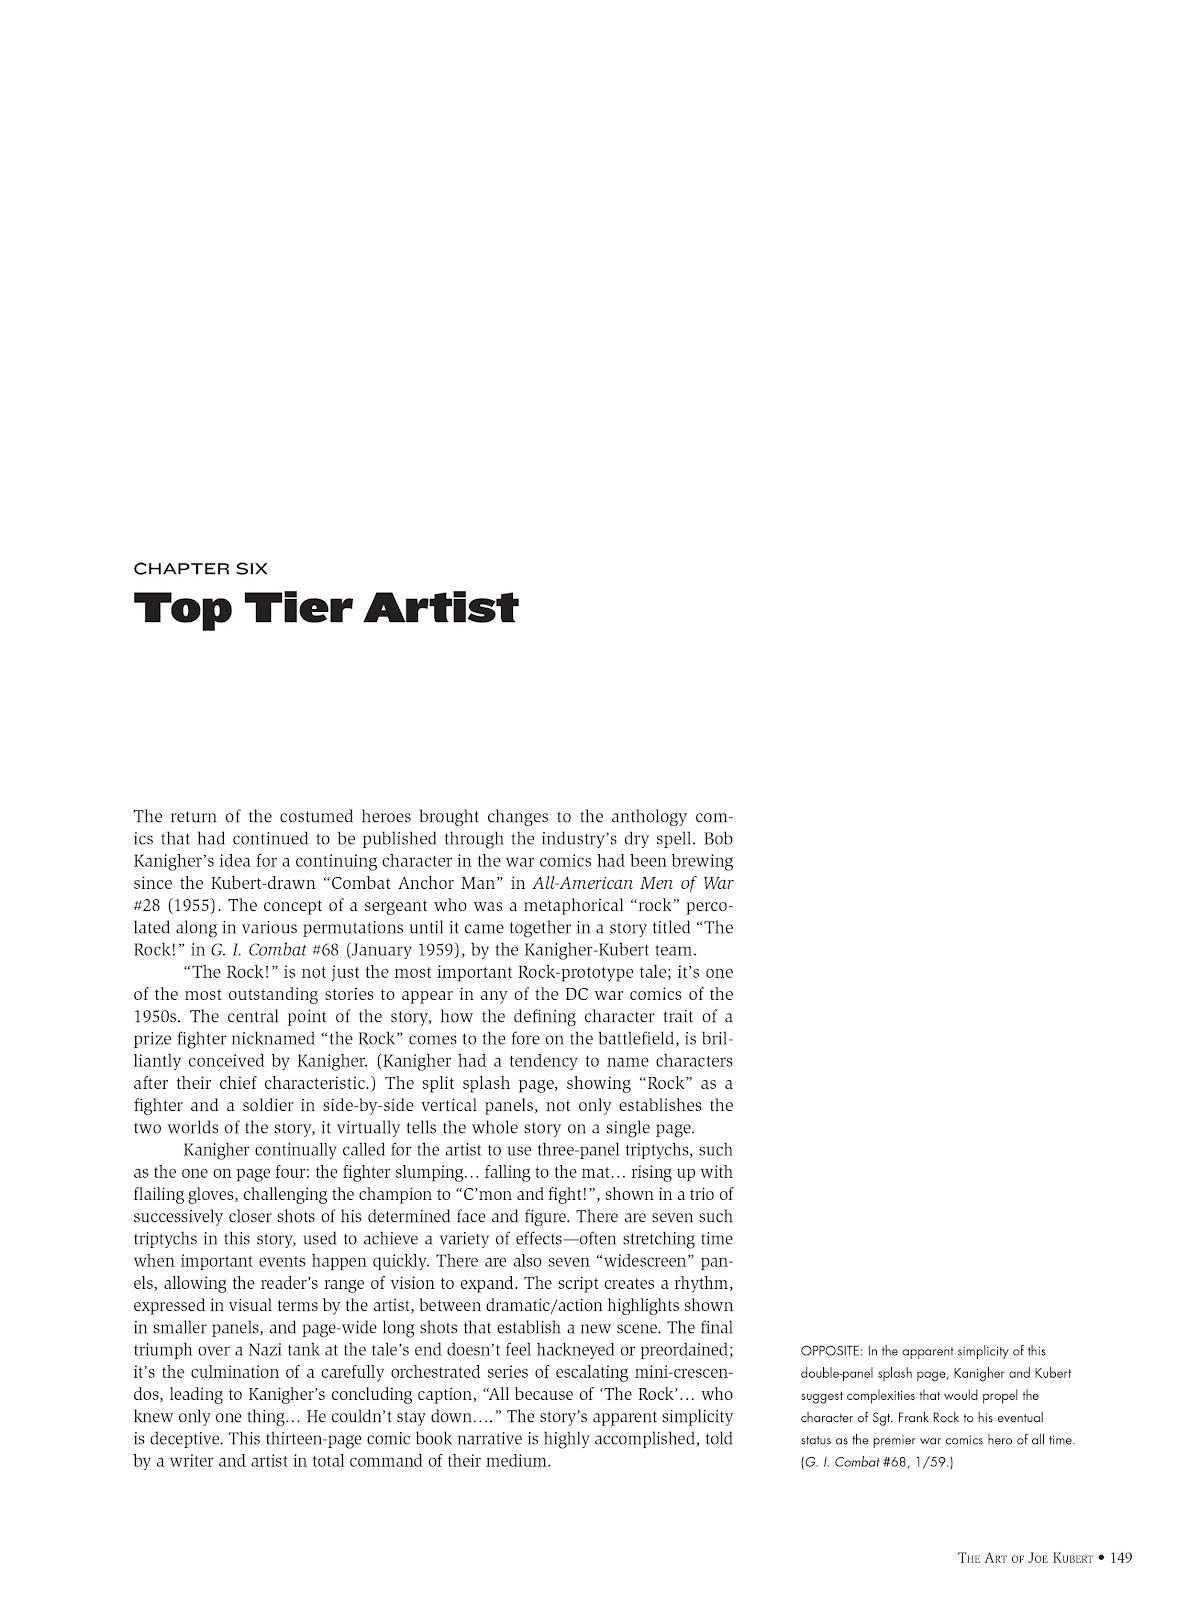 Read online The Art of Joe Kubert comic -  Issue # TPB (Part 2) - 49